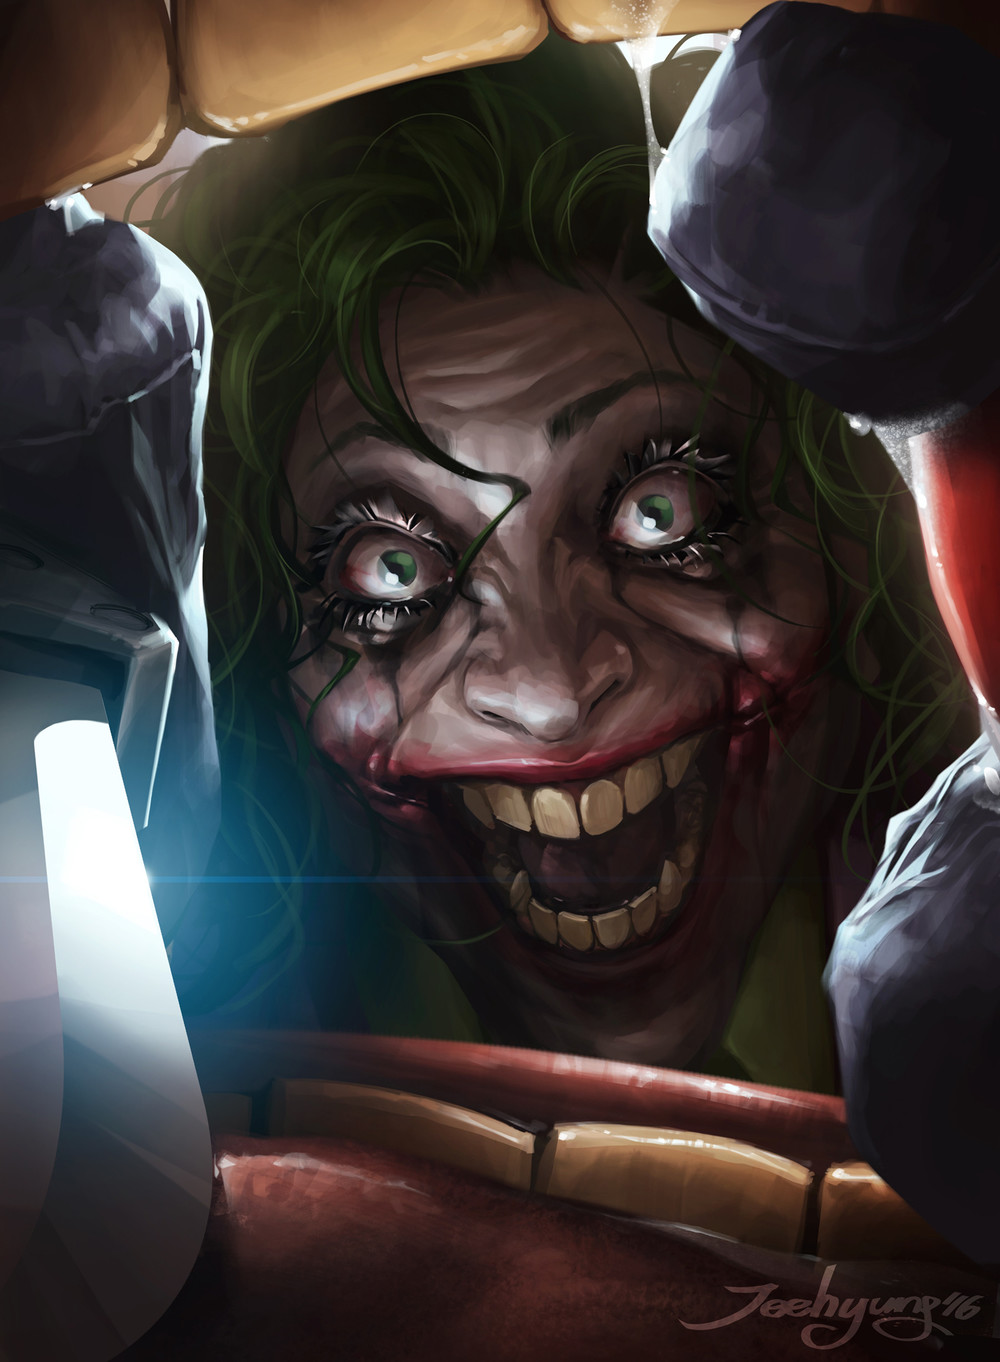 terrifying-art-of-martha-wayne-as-the-joker-from-flashpoint